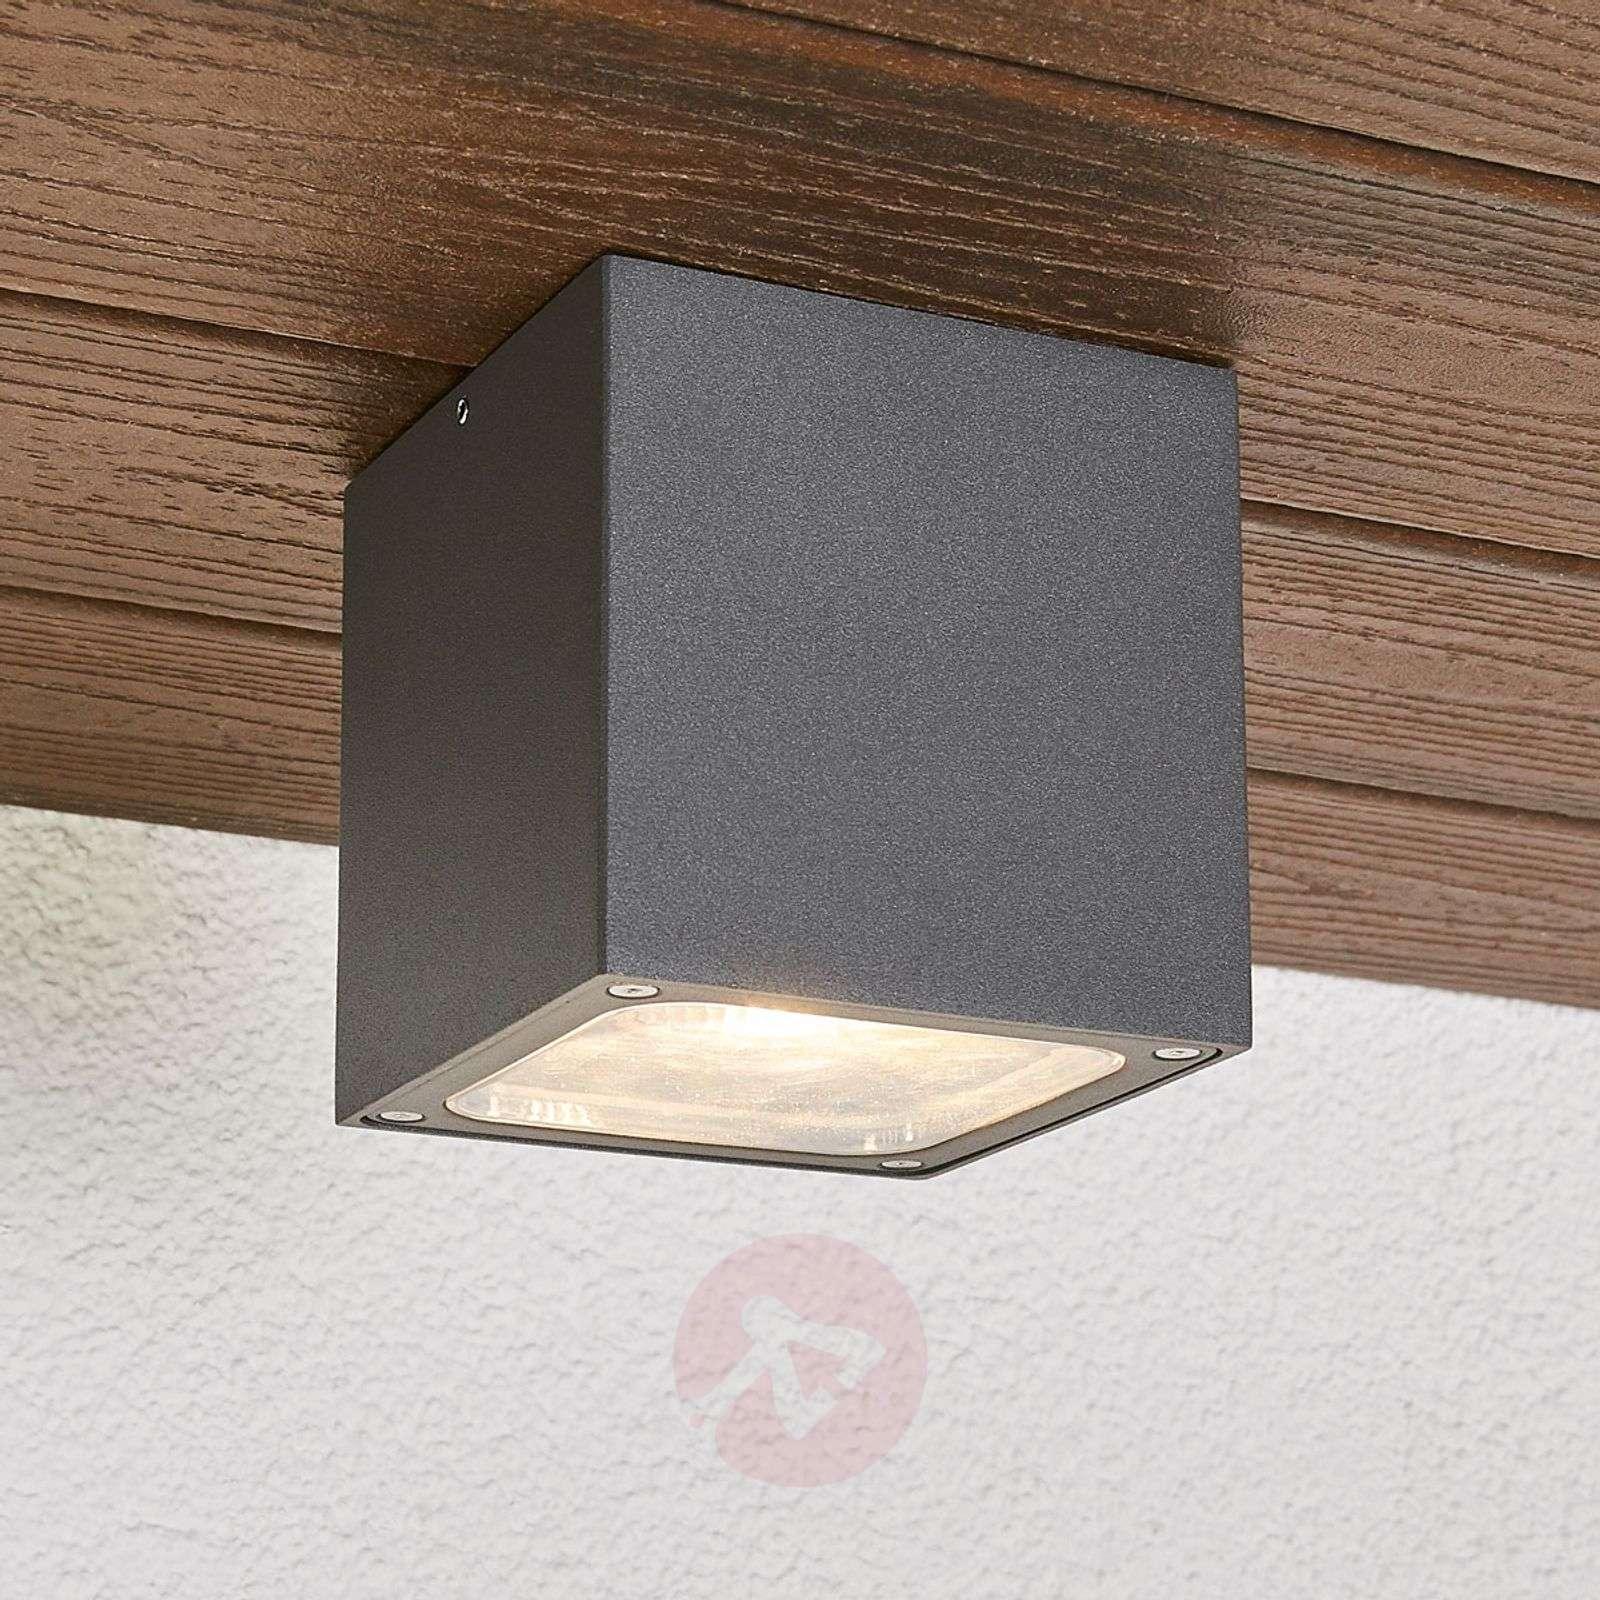 Tanea cube shaped led ceiling light ip54 lights tanea cube shaped led ceiling light ip54 9969064 01 aloadofball Choice Image